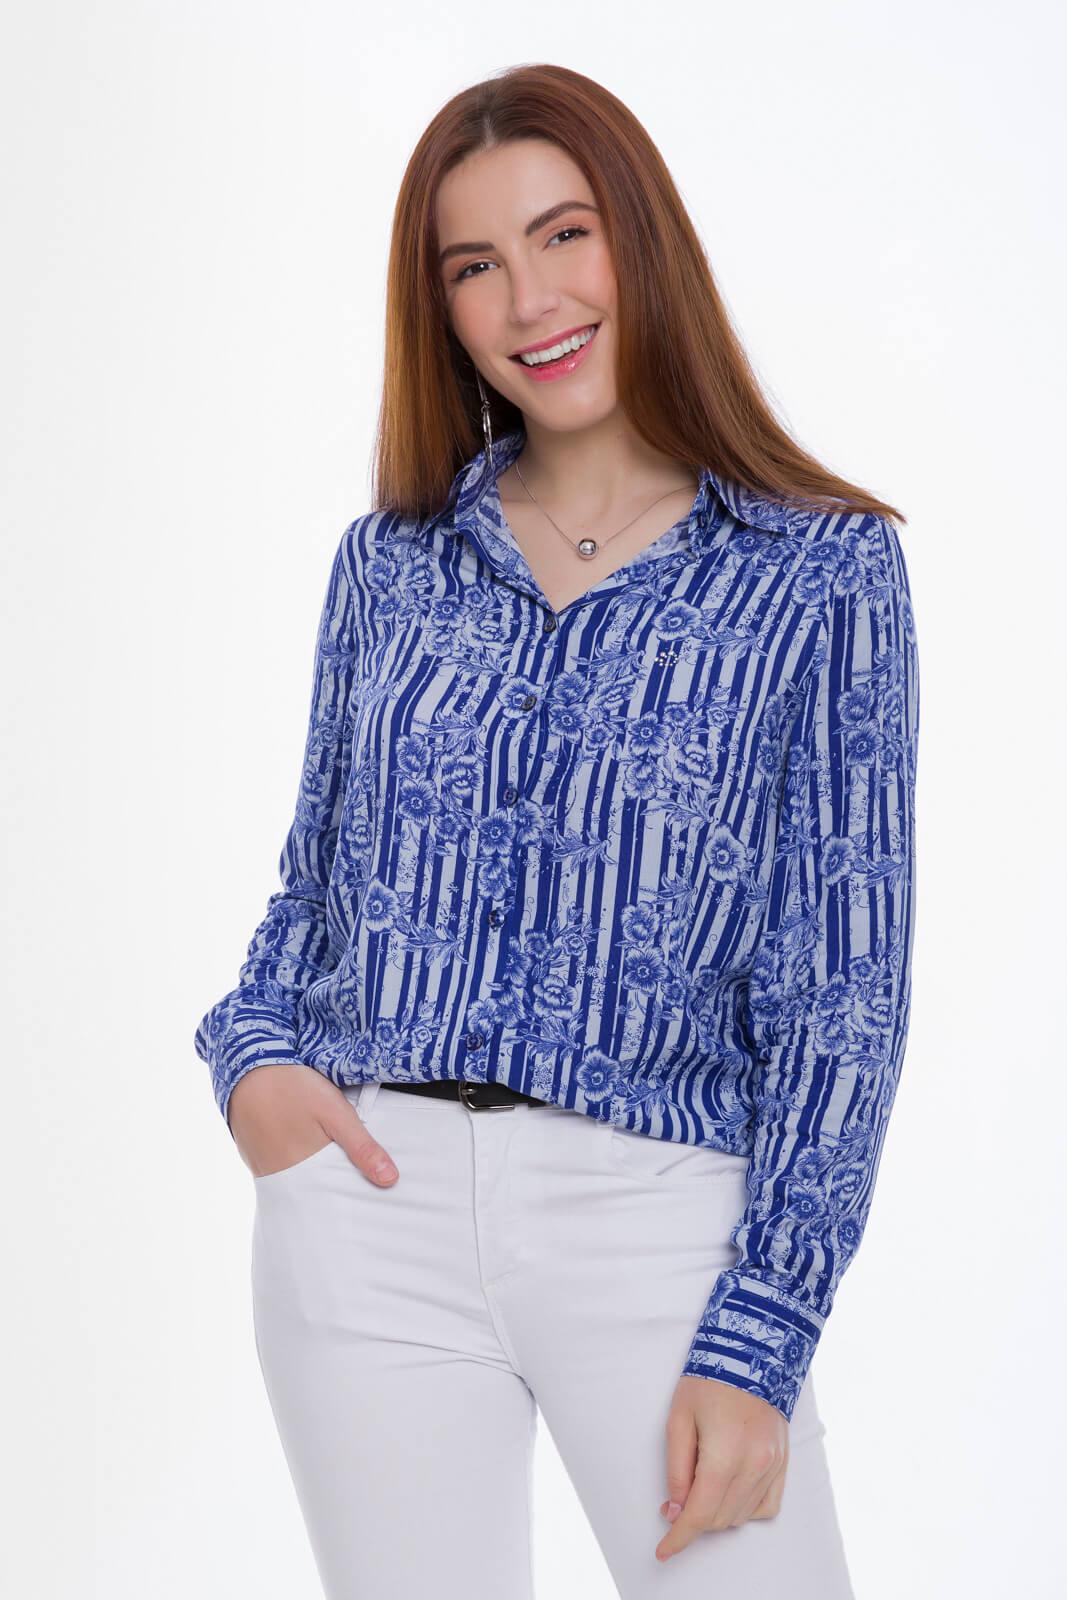 Camisa Feminina Olimpo Viscose Estampada Azul Floral Manga Longa